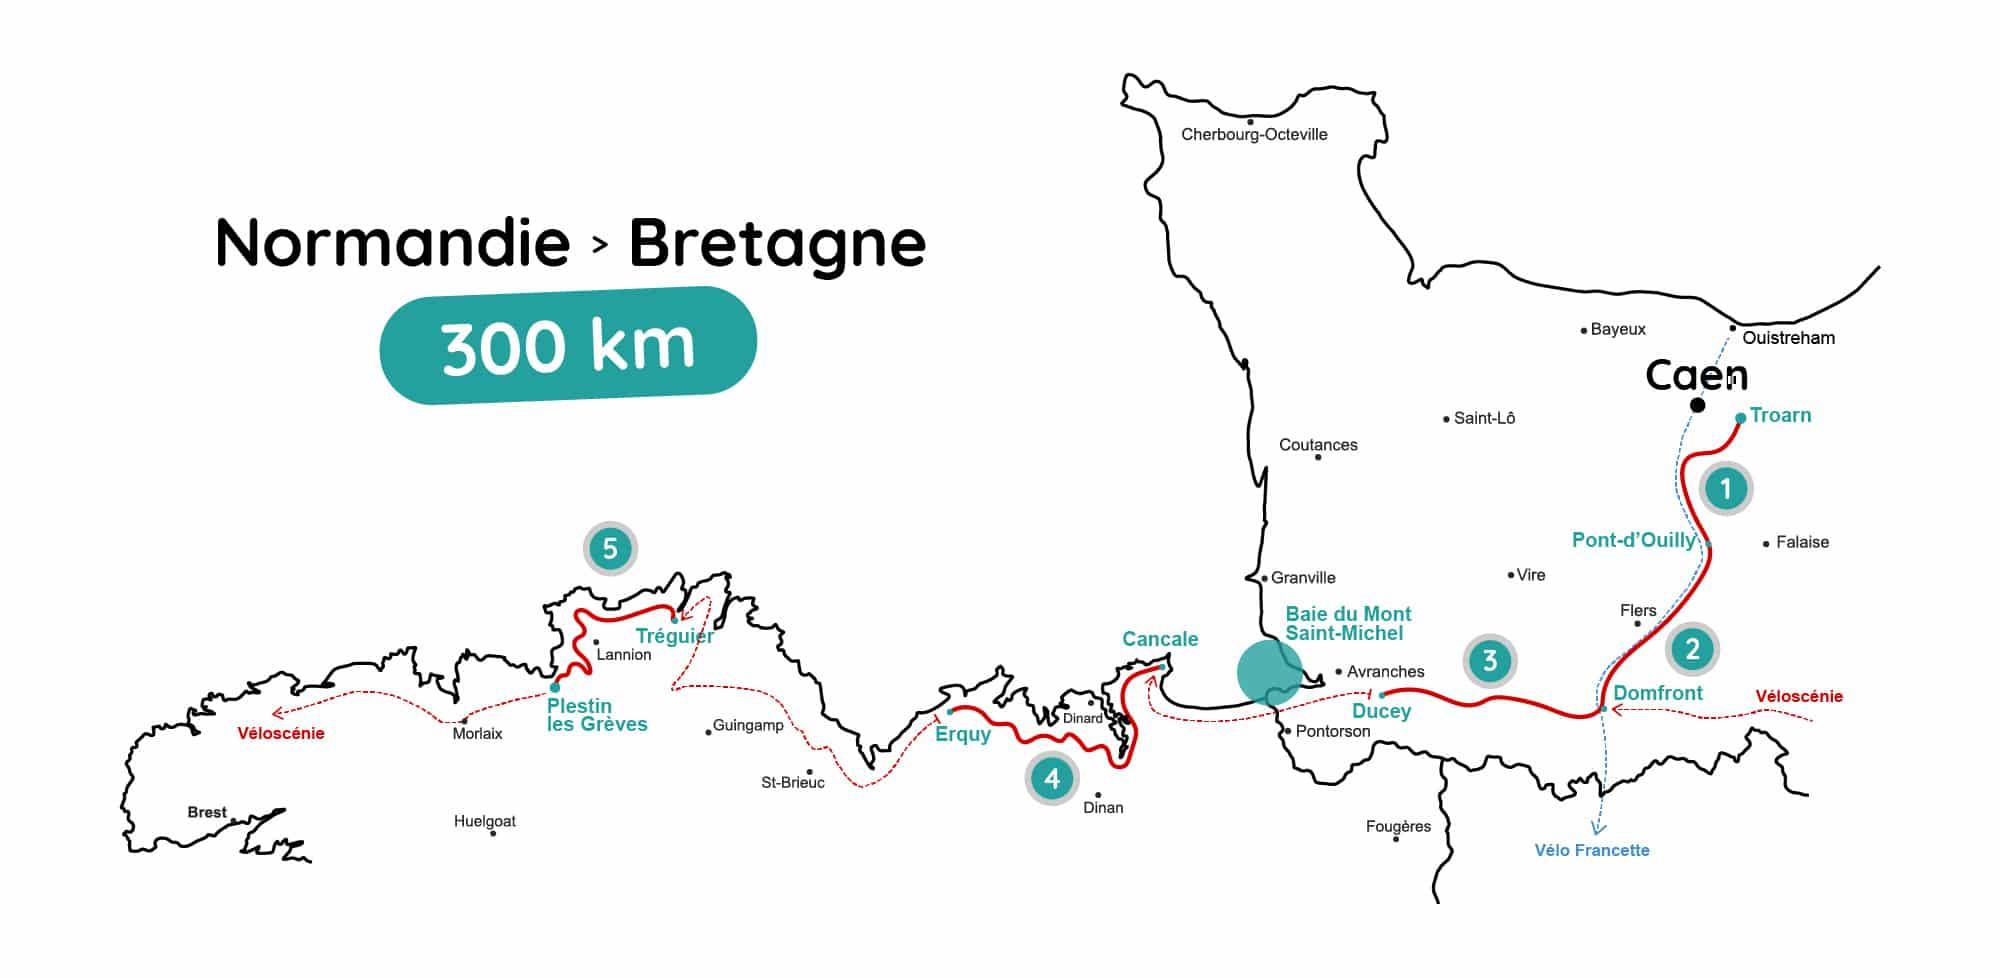 Roadtrip velo carte Normandie Bretagne wildspot